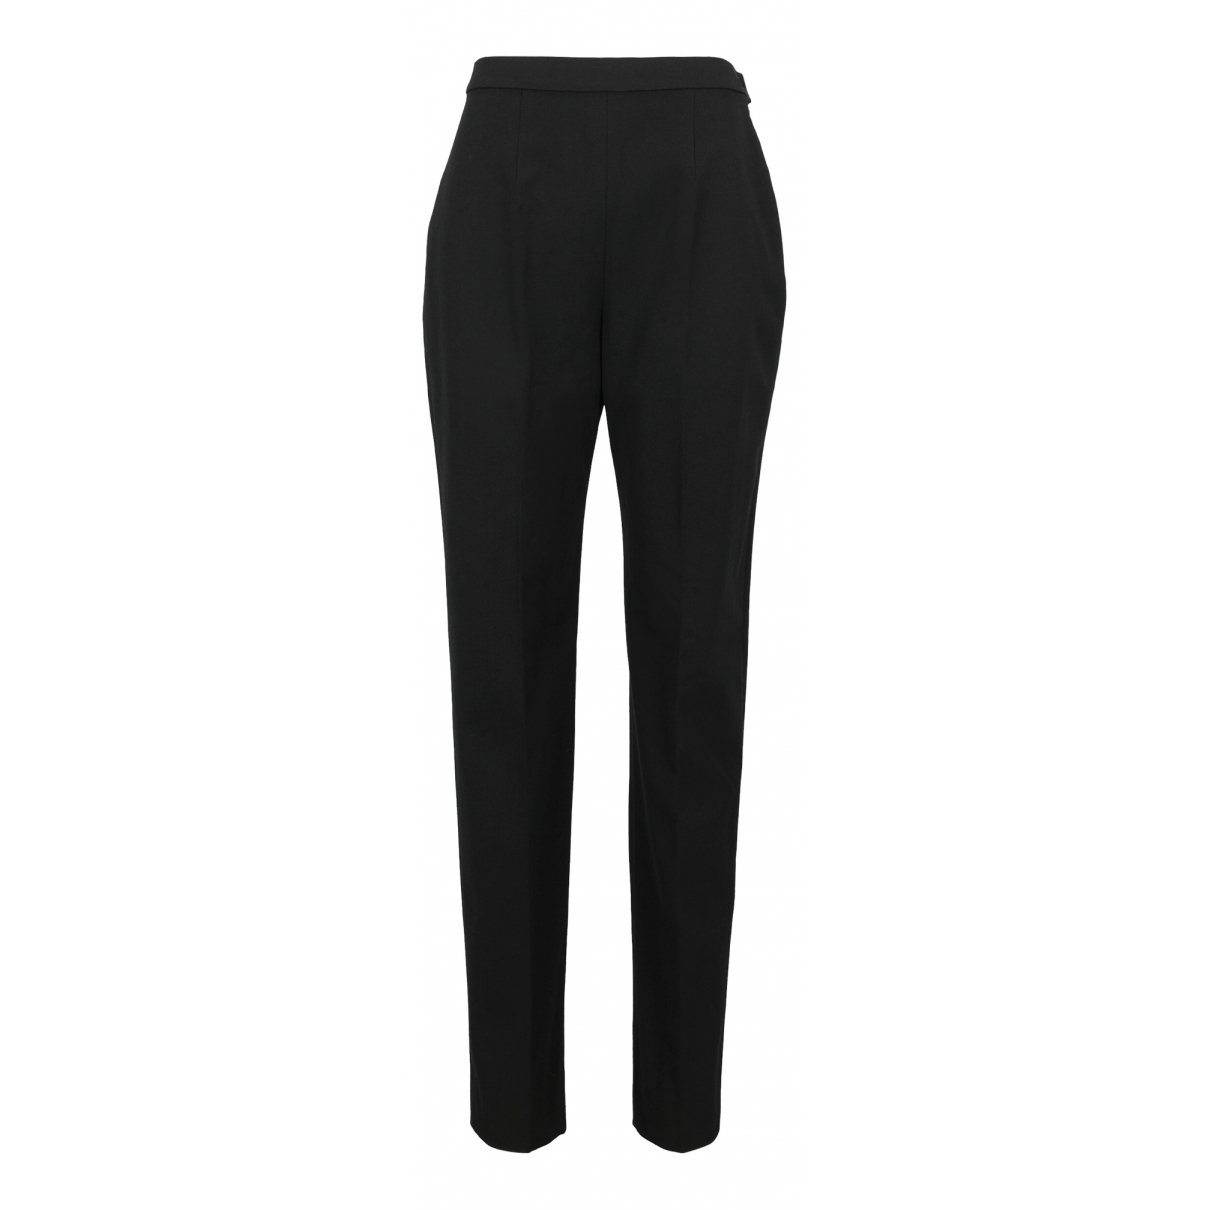 Max Mara \N Black Wool Trousers for Women 46 IT